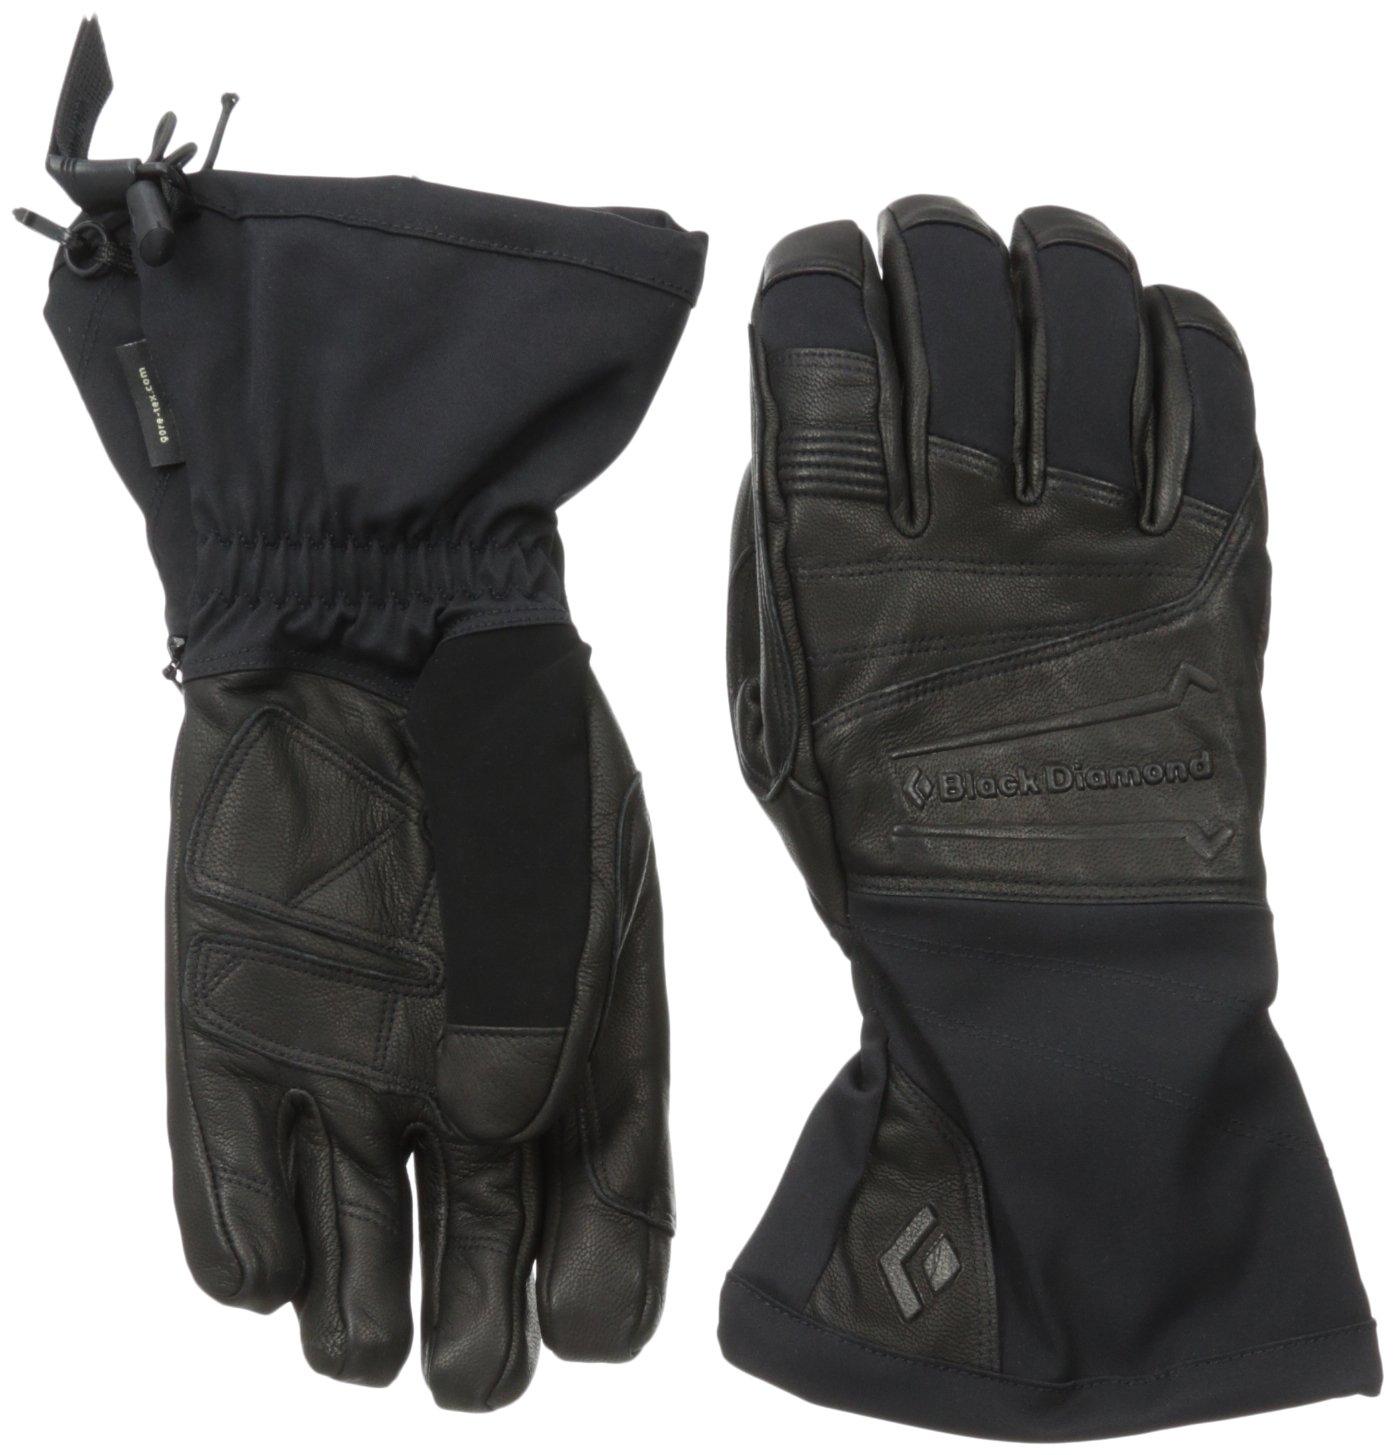 Black diamond virago gloves - Black Diamond Virago Gloves 27